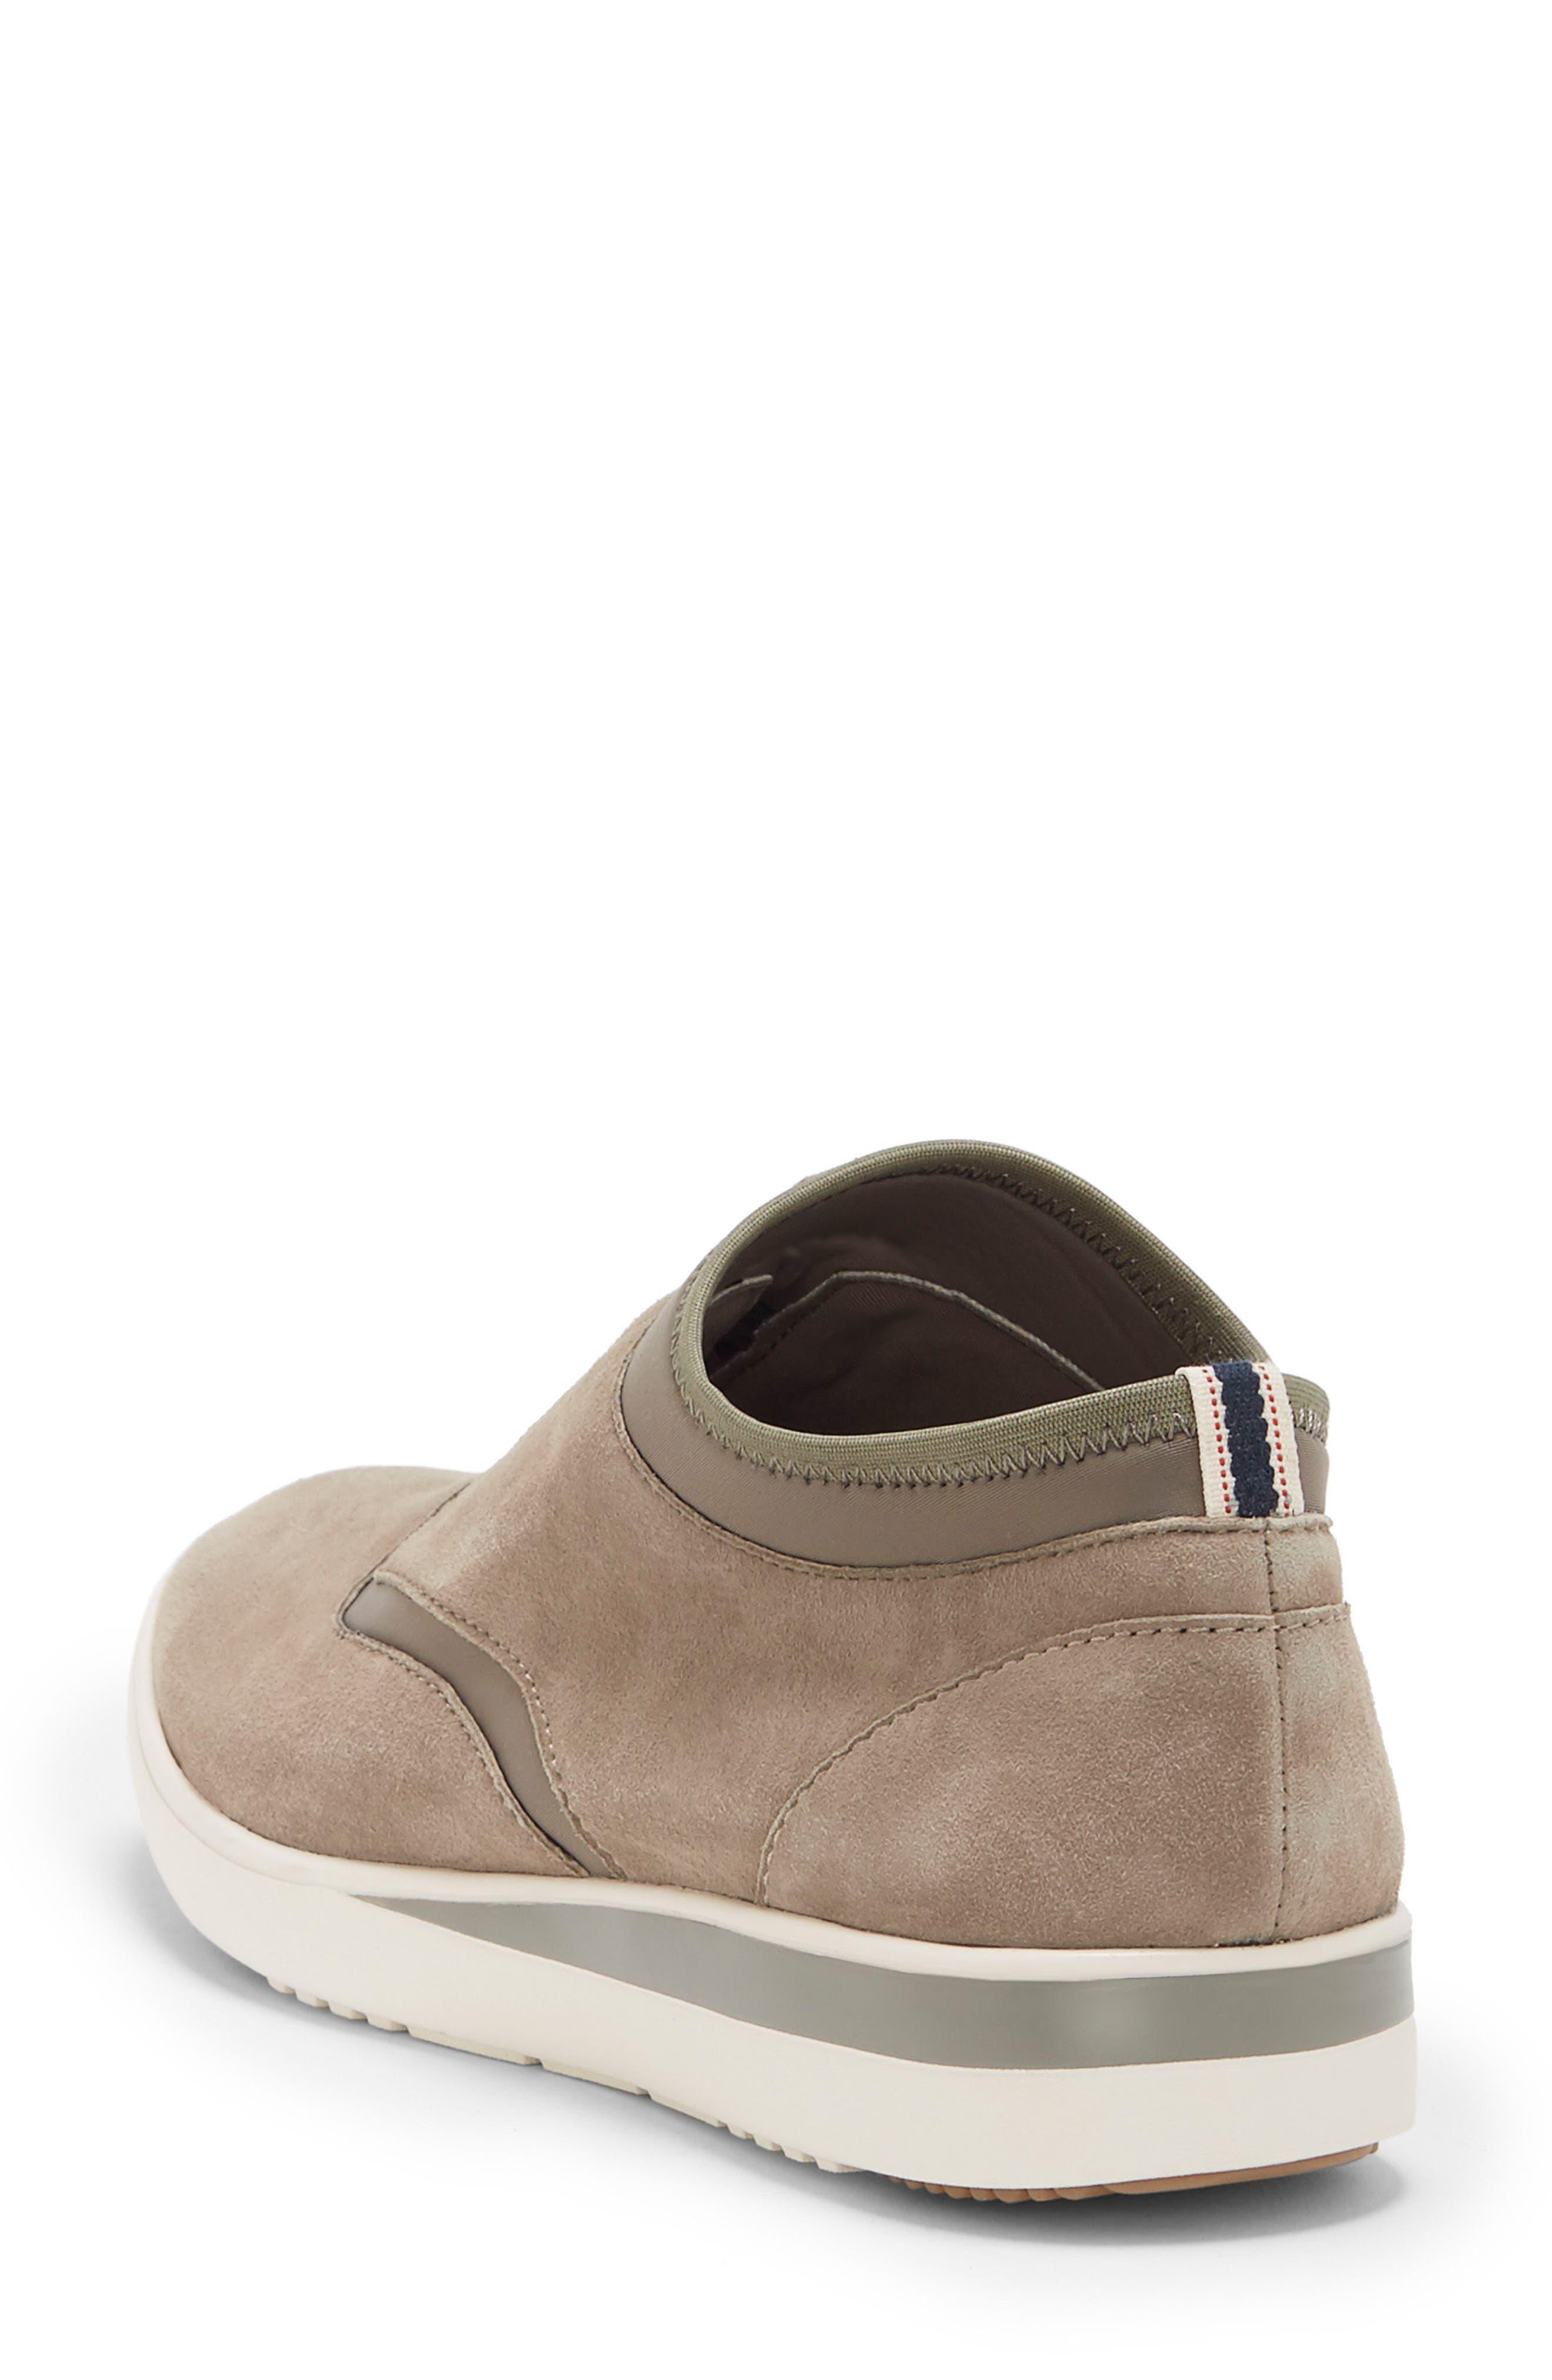 Atala Sneaker,                             Alternate thumbnail 5, color,